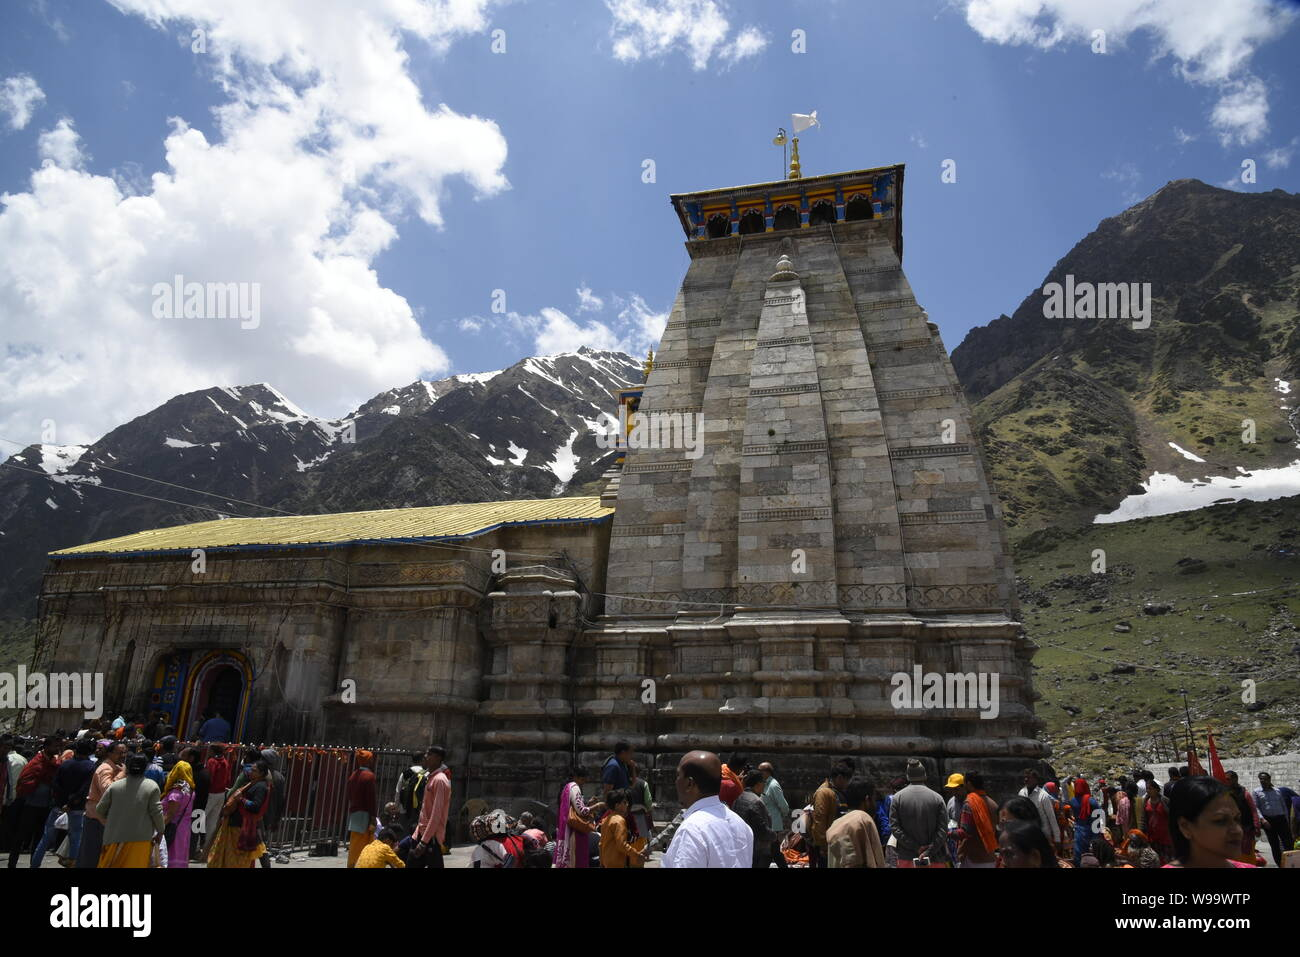 Santo Templo Hindú del Señor Shri Kedarnath Shankar Templo Bholenath 2019 vista en el distrito de Chamoli/Rudraprayag , Uttrakhand , India , Asia Foto de stock